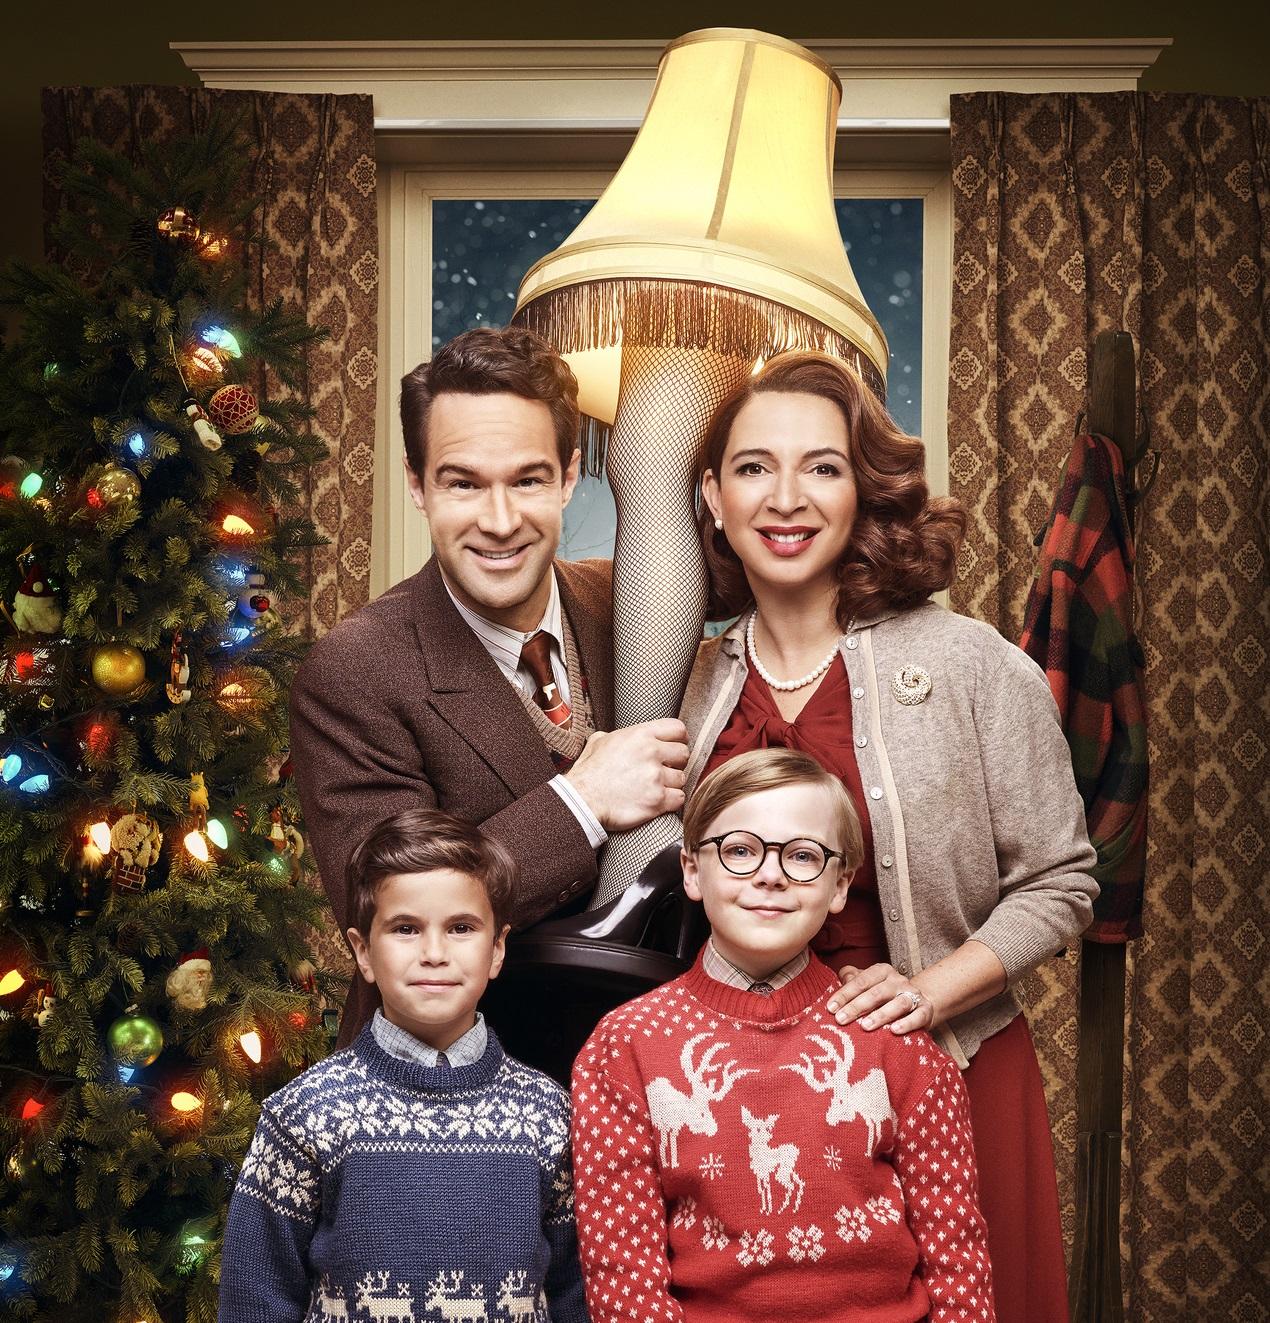 A Christmas Story Live, A Christmas Story Live Streaming, Watch A Christmas Story Live Online, Watch FOX Online, Fox Live Stream